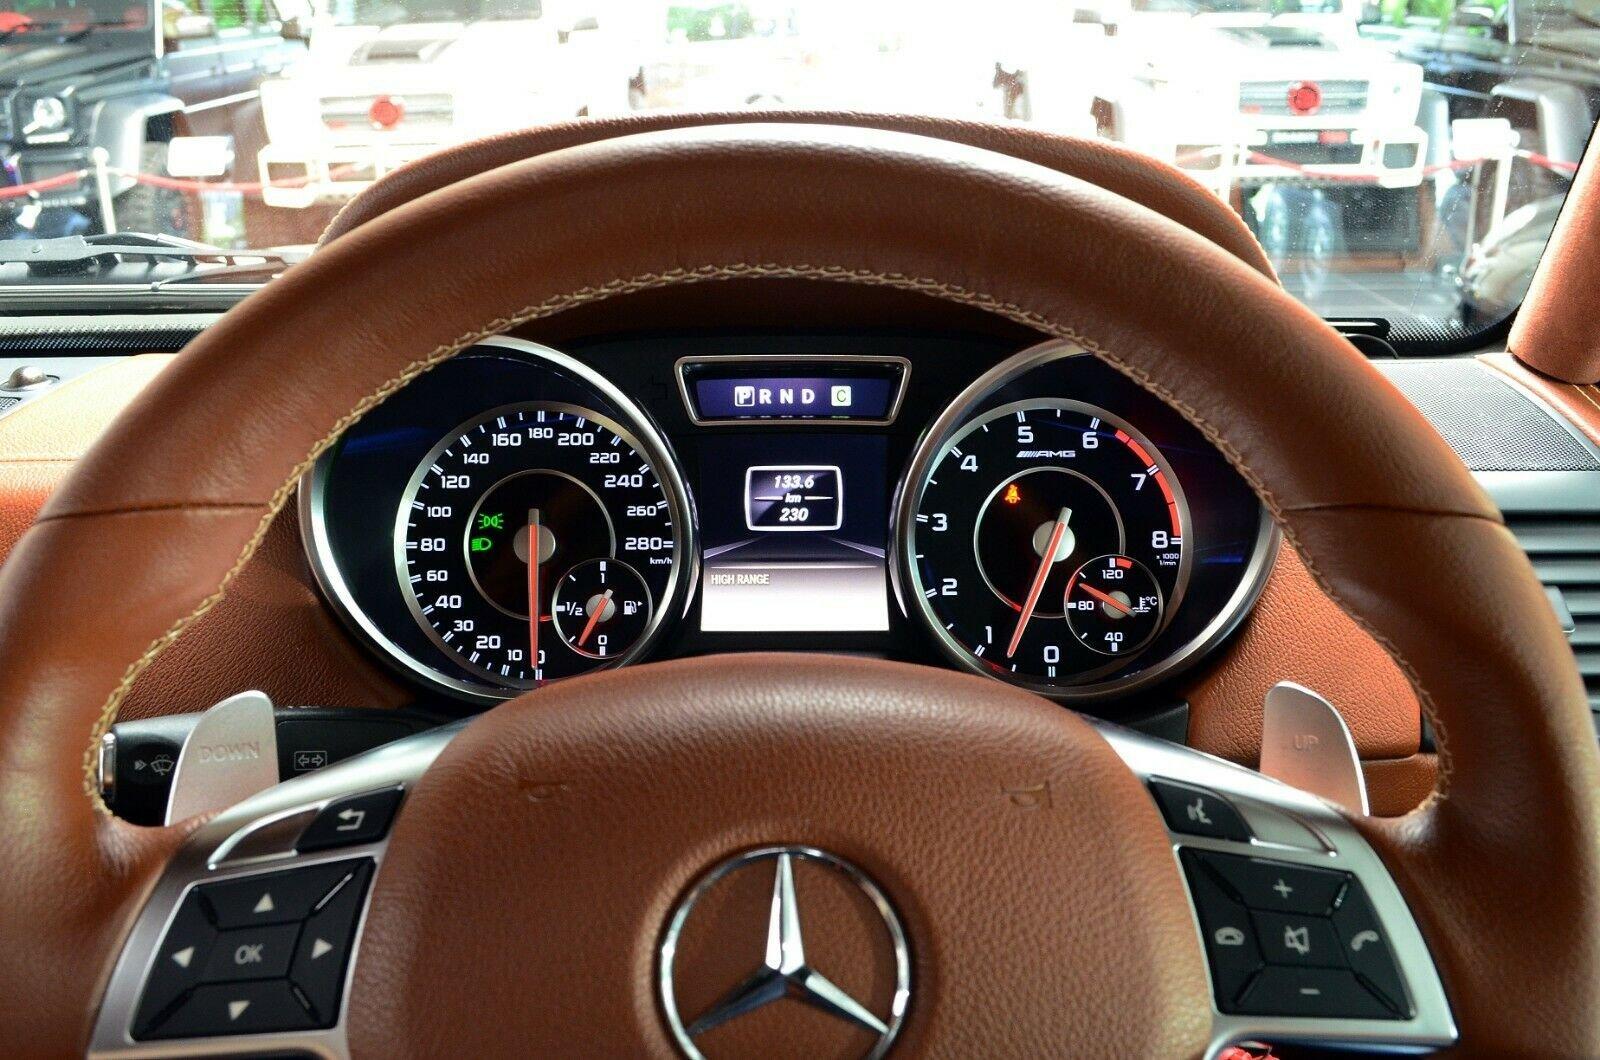 Mercedes-Benz G 63 AMG 6x6 Brabus700 - 1of15 (17)